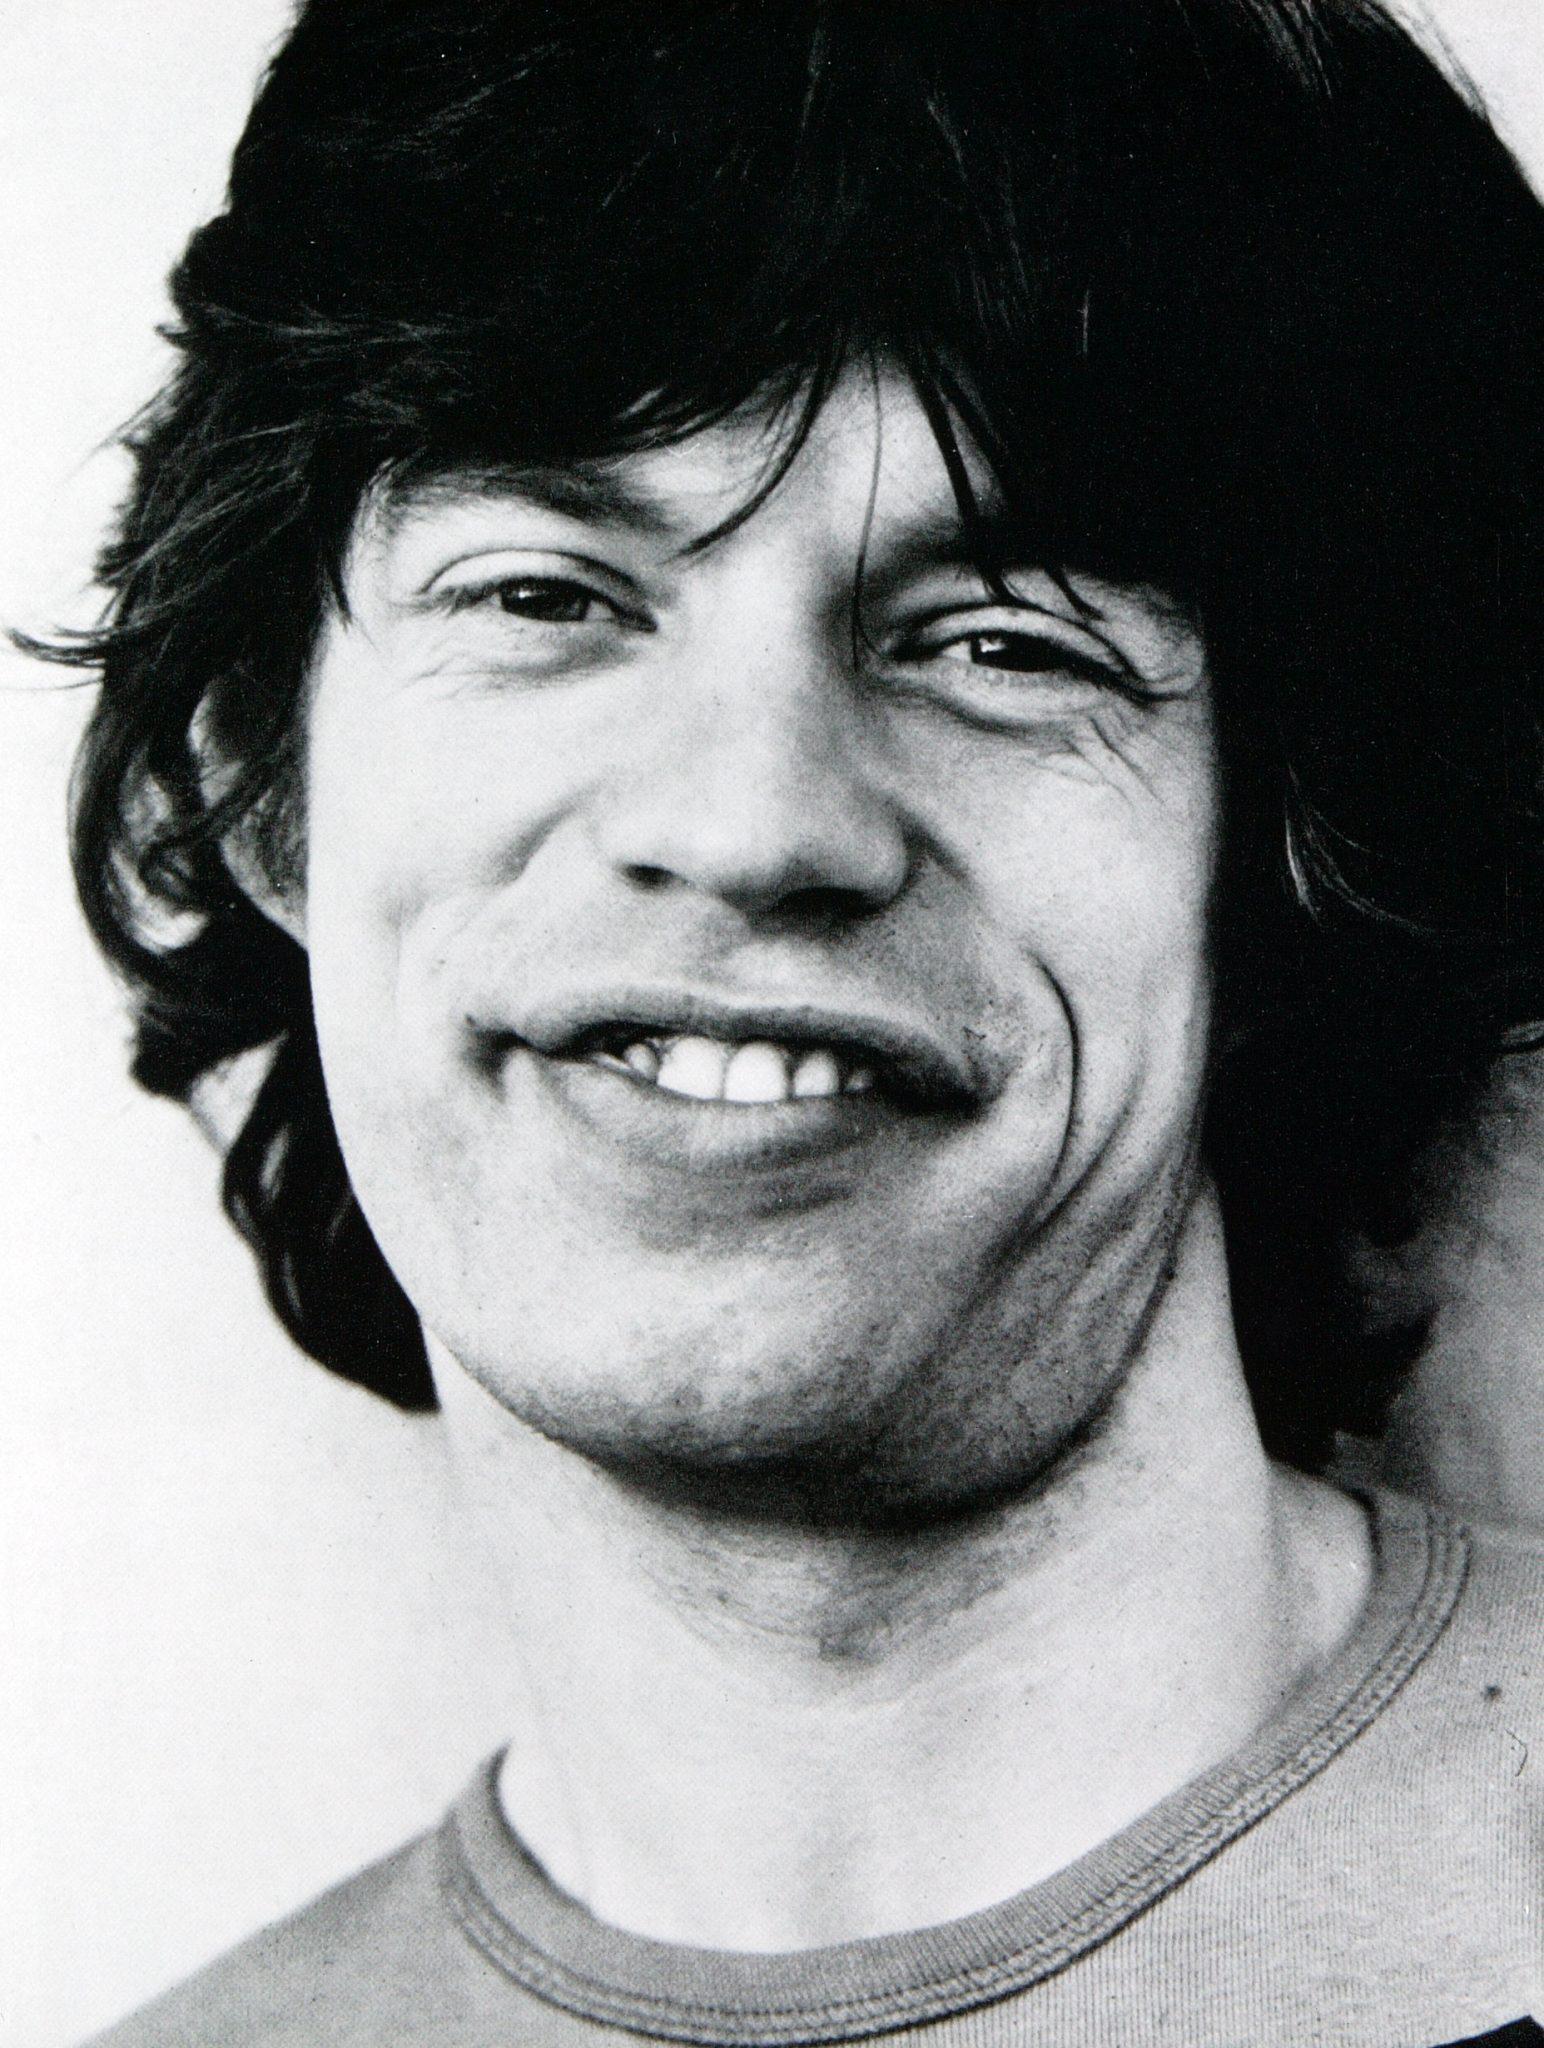 Oliviero Toscani, Mick Jagger, vogue 1971 @olivierotoscani